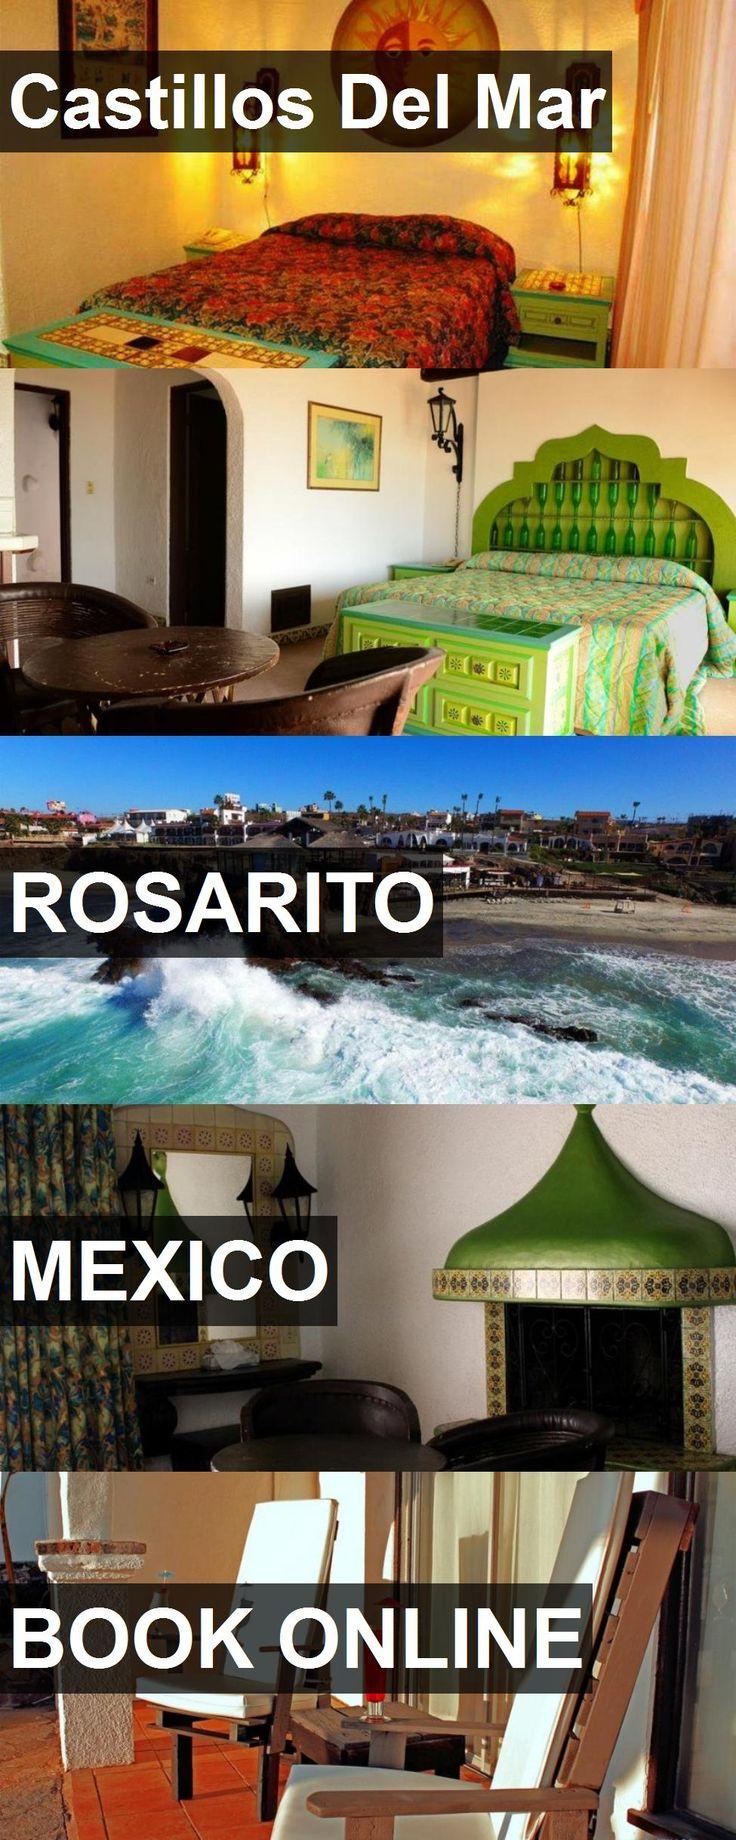 Hotel Castillos Del Mar in Rosarito, Mexico. For more information, photos, reviews and best prices please follow the link. #Mexico #Rosarito #CastillosDelMar #hotel #travel #vacation